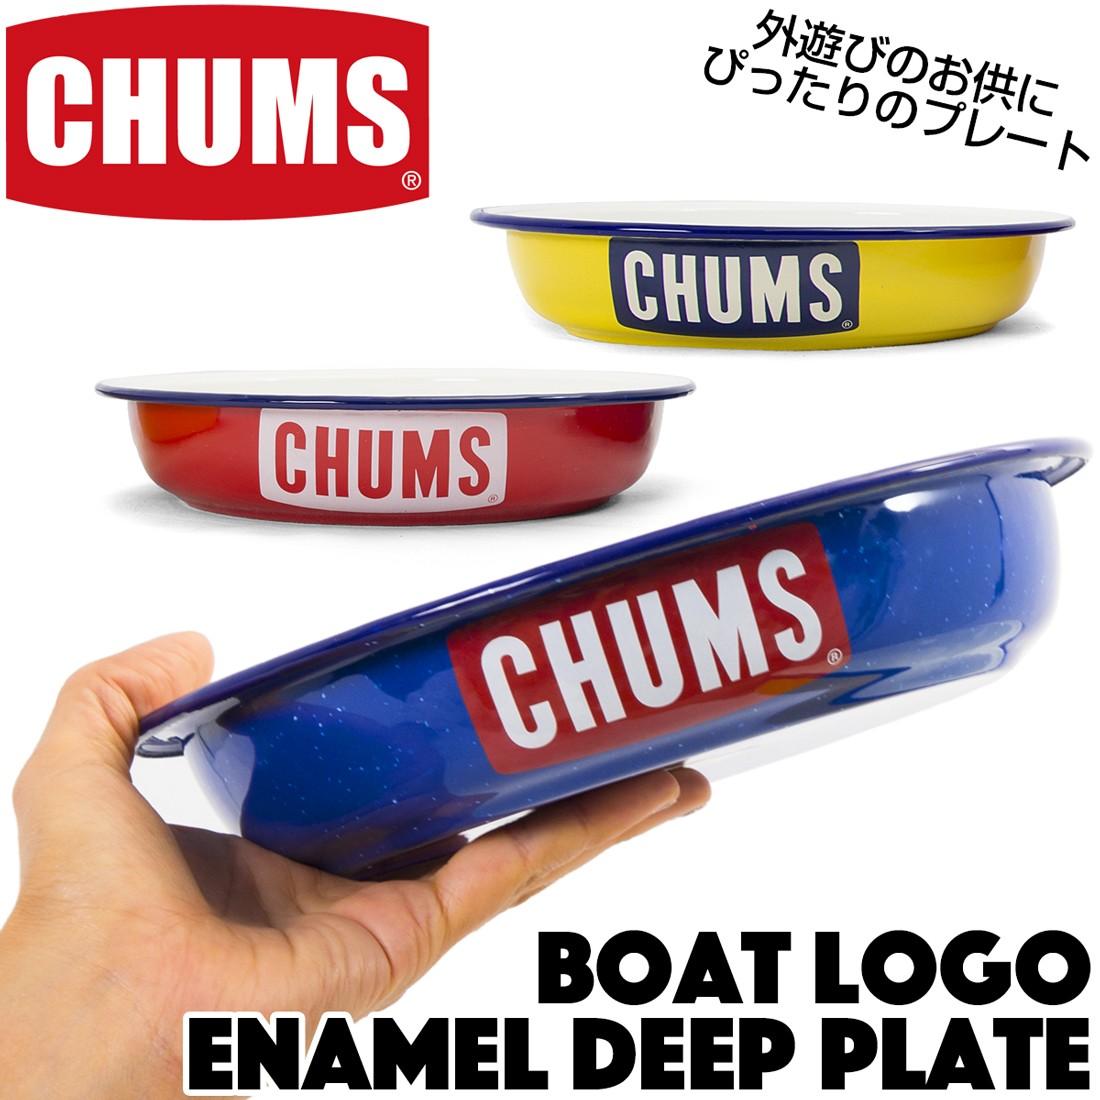 CHUMS Boat Logo Enamel Deep Plate